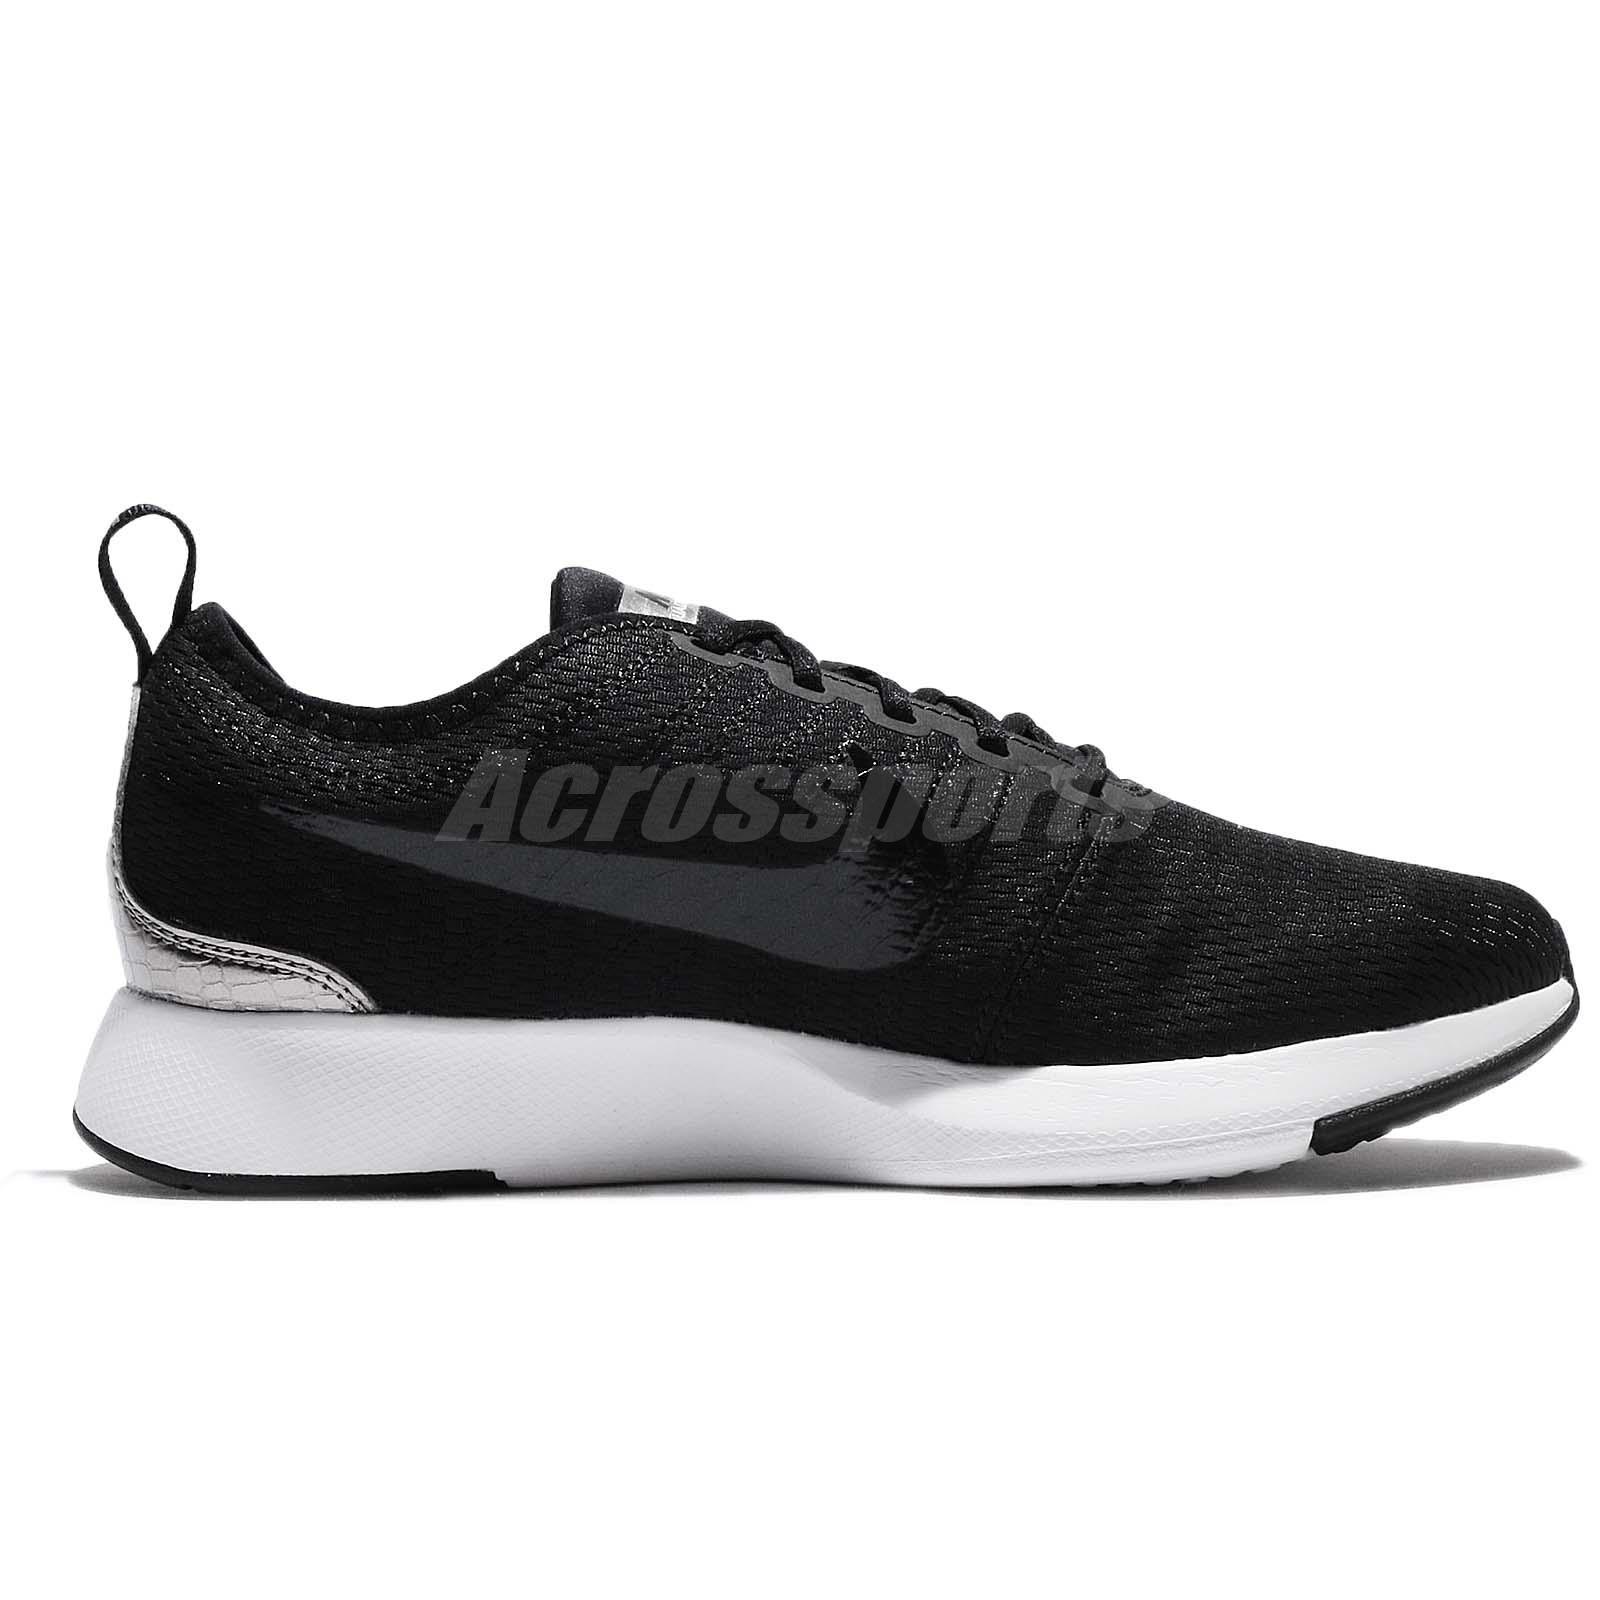 Nike Dualtone Racer GS Black Pewter White Womens Kids Running Shoes ... 546a5b8d6eb99